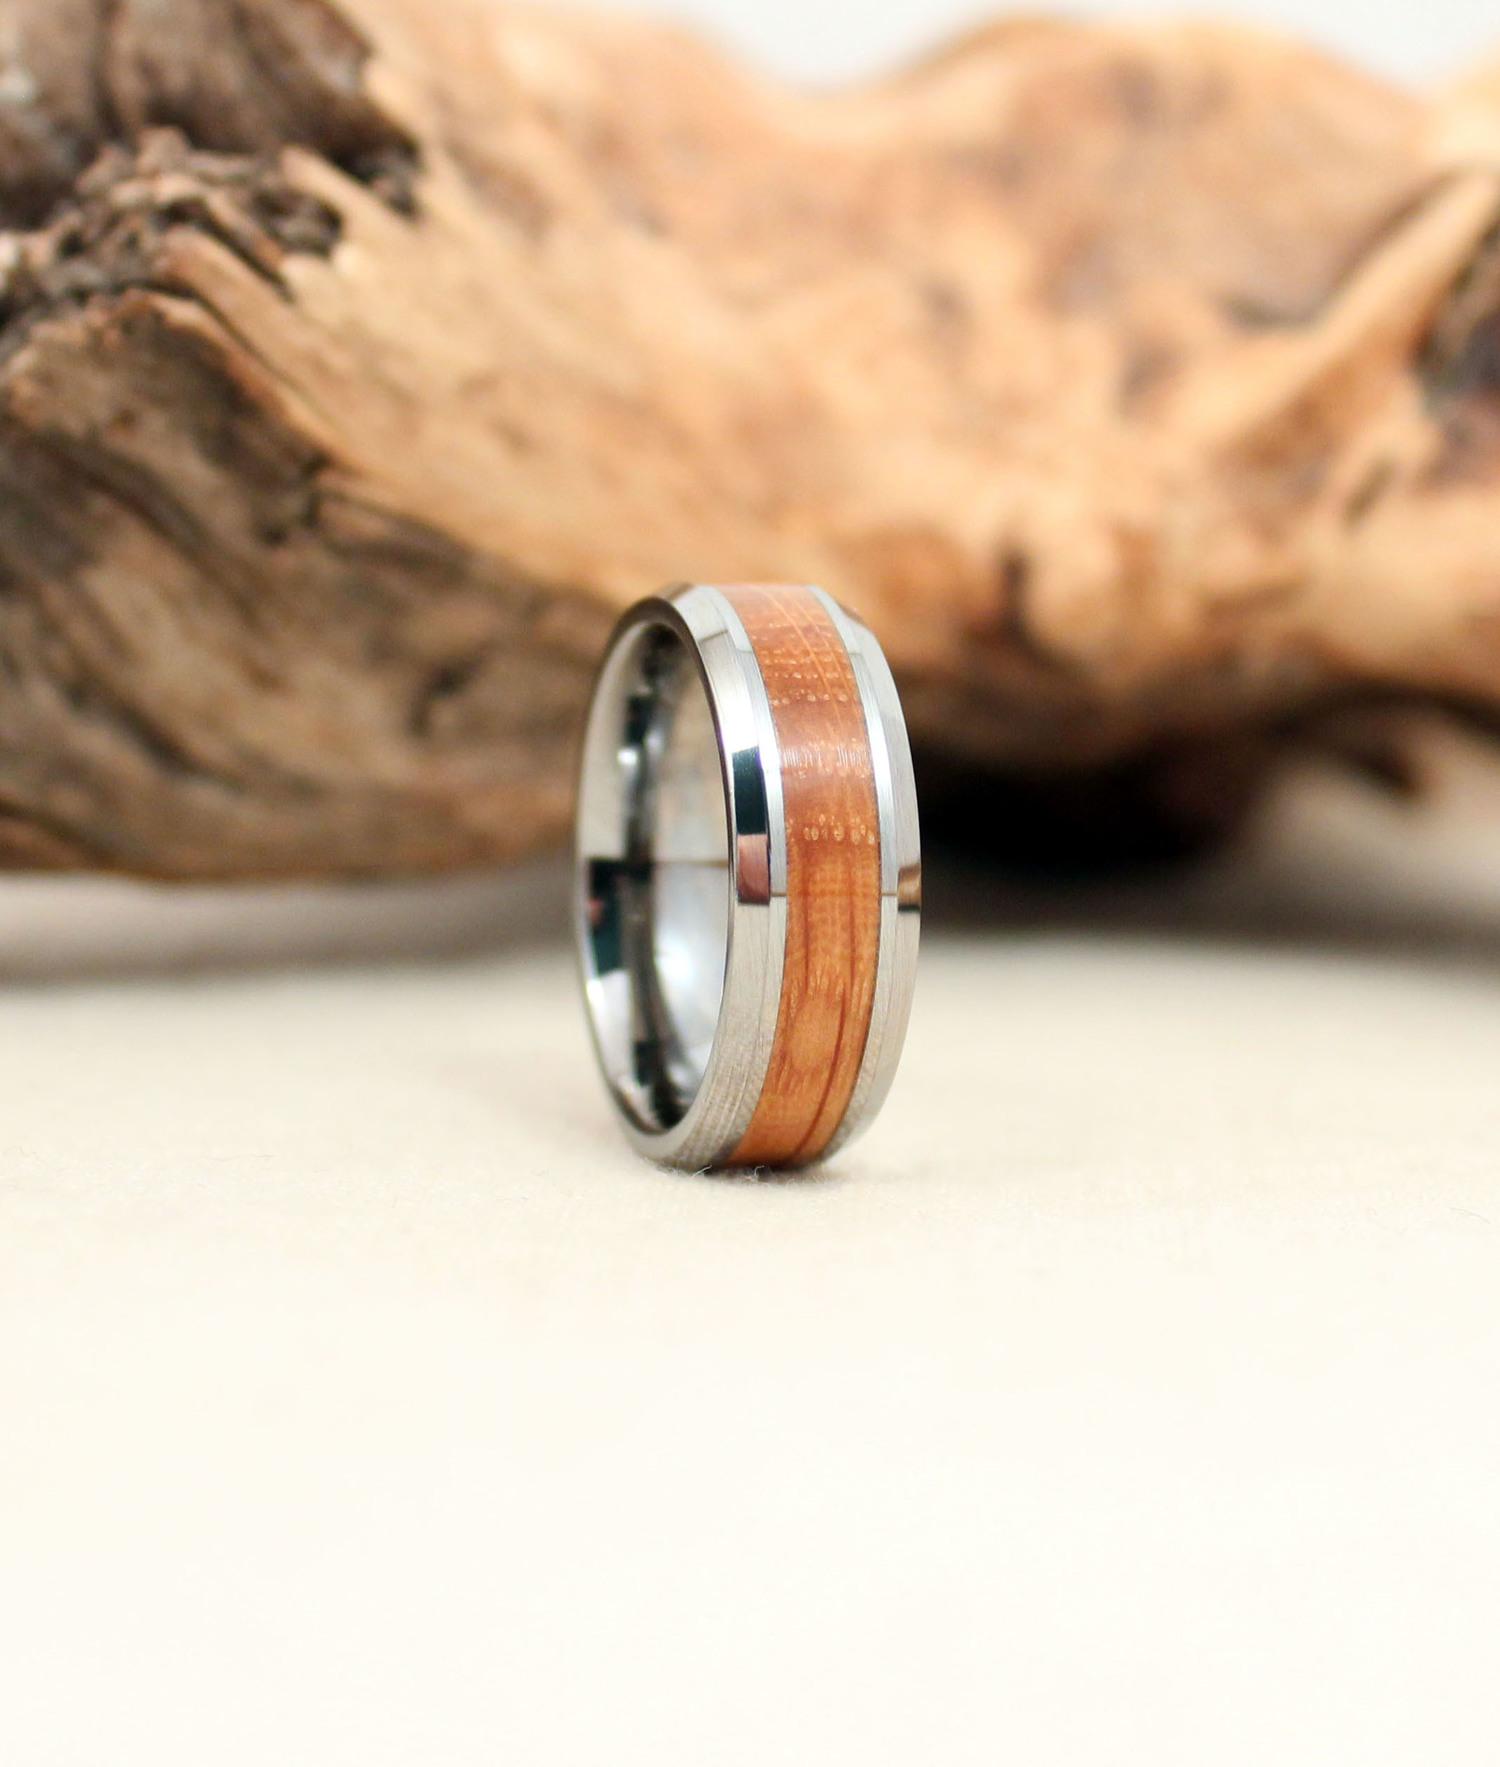 Tungsten Carbide with Bourbon Barrel Stave White Oak Wooden Ring